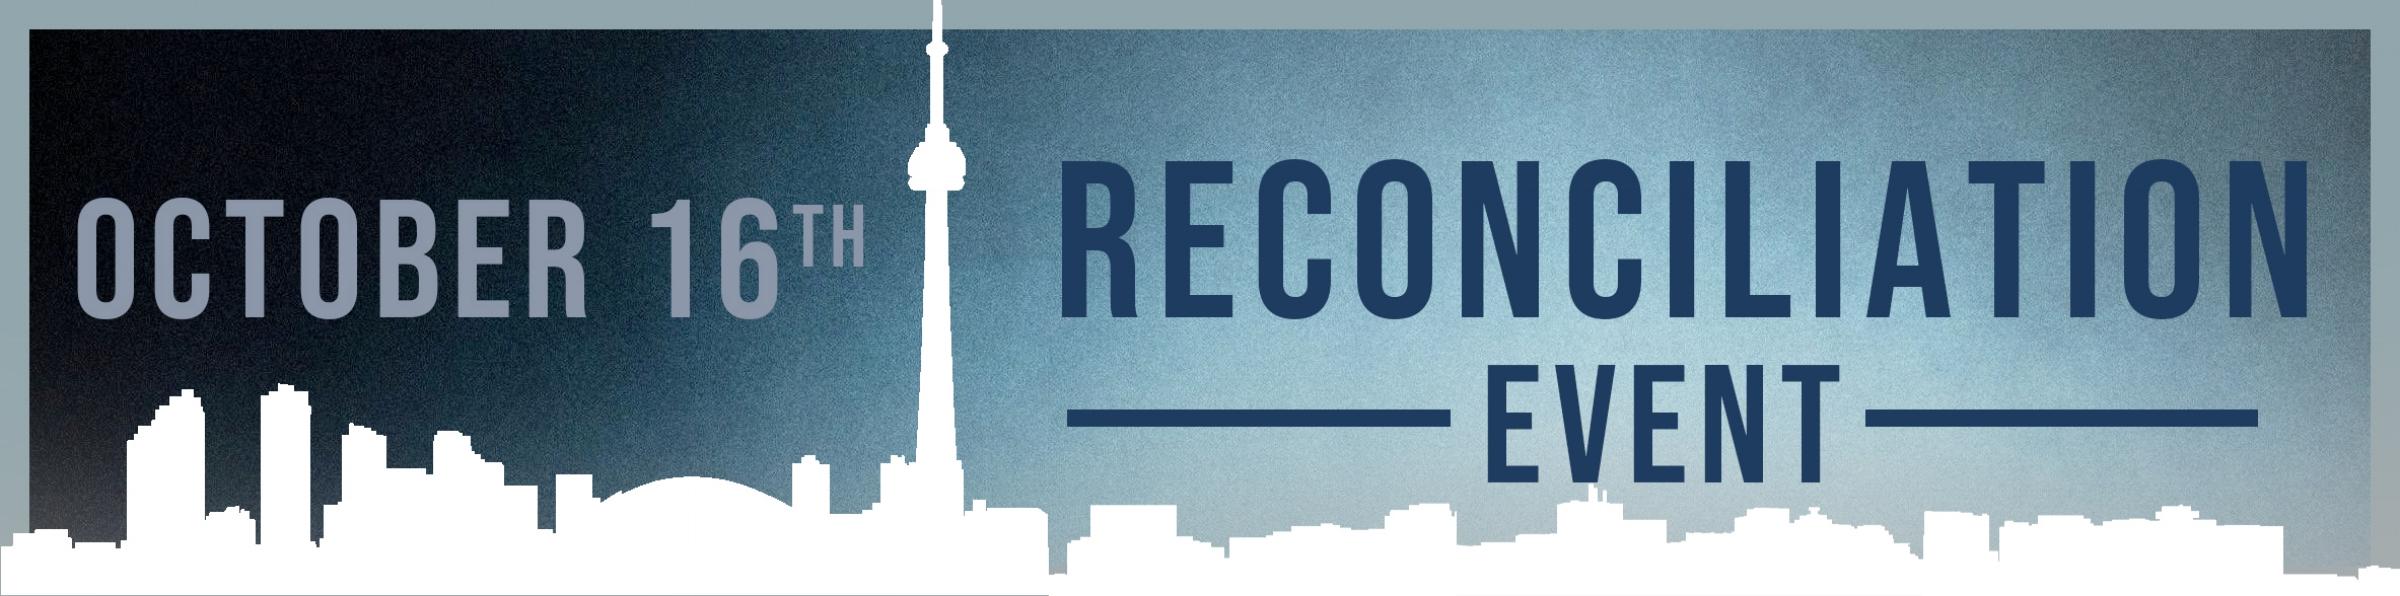 ReconciliationEvent-Banner.jpeg